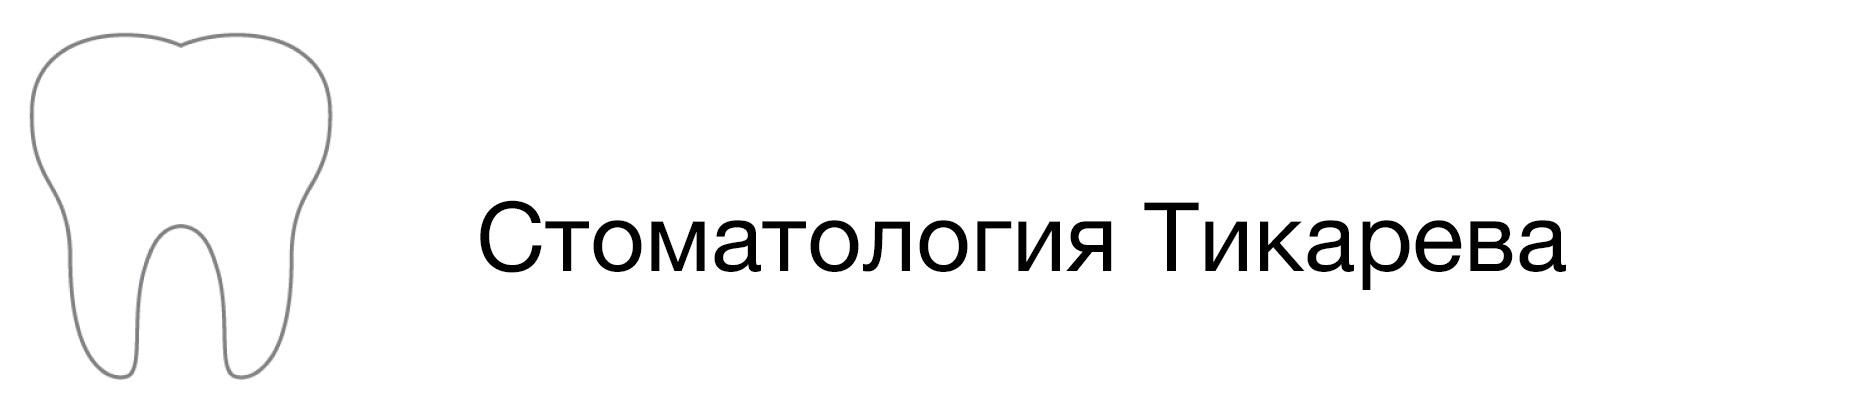 Сайт стоматолога Тикарева Равиля Рашидовича